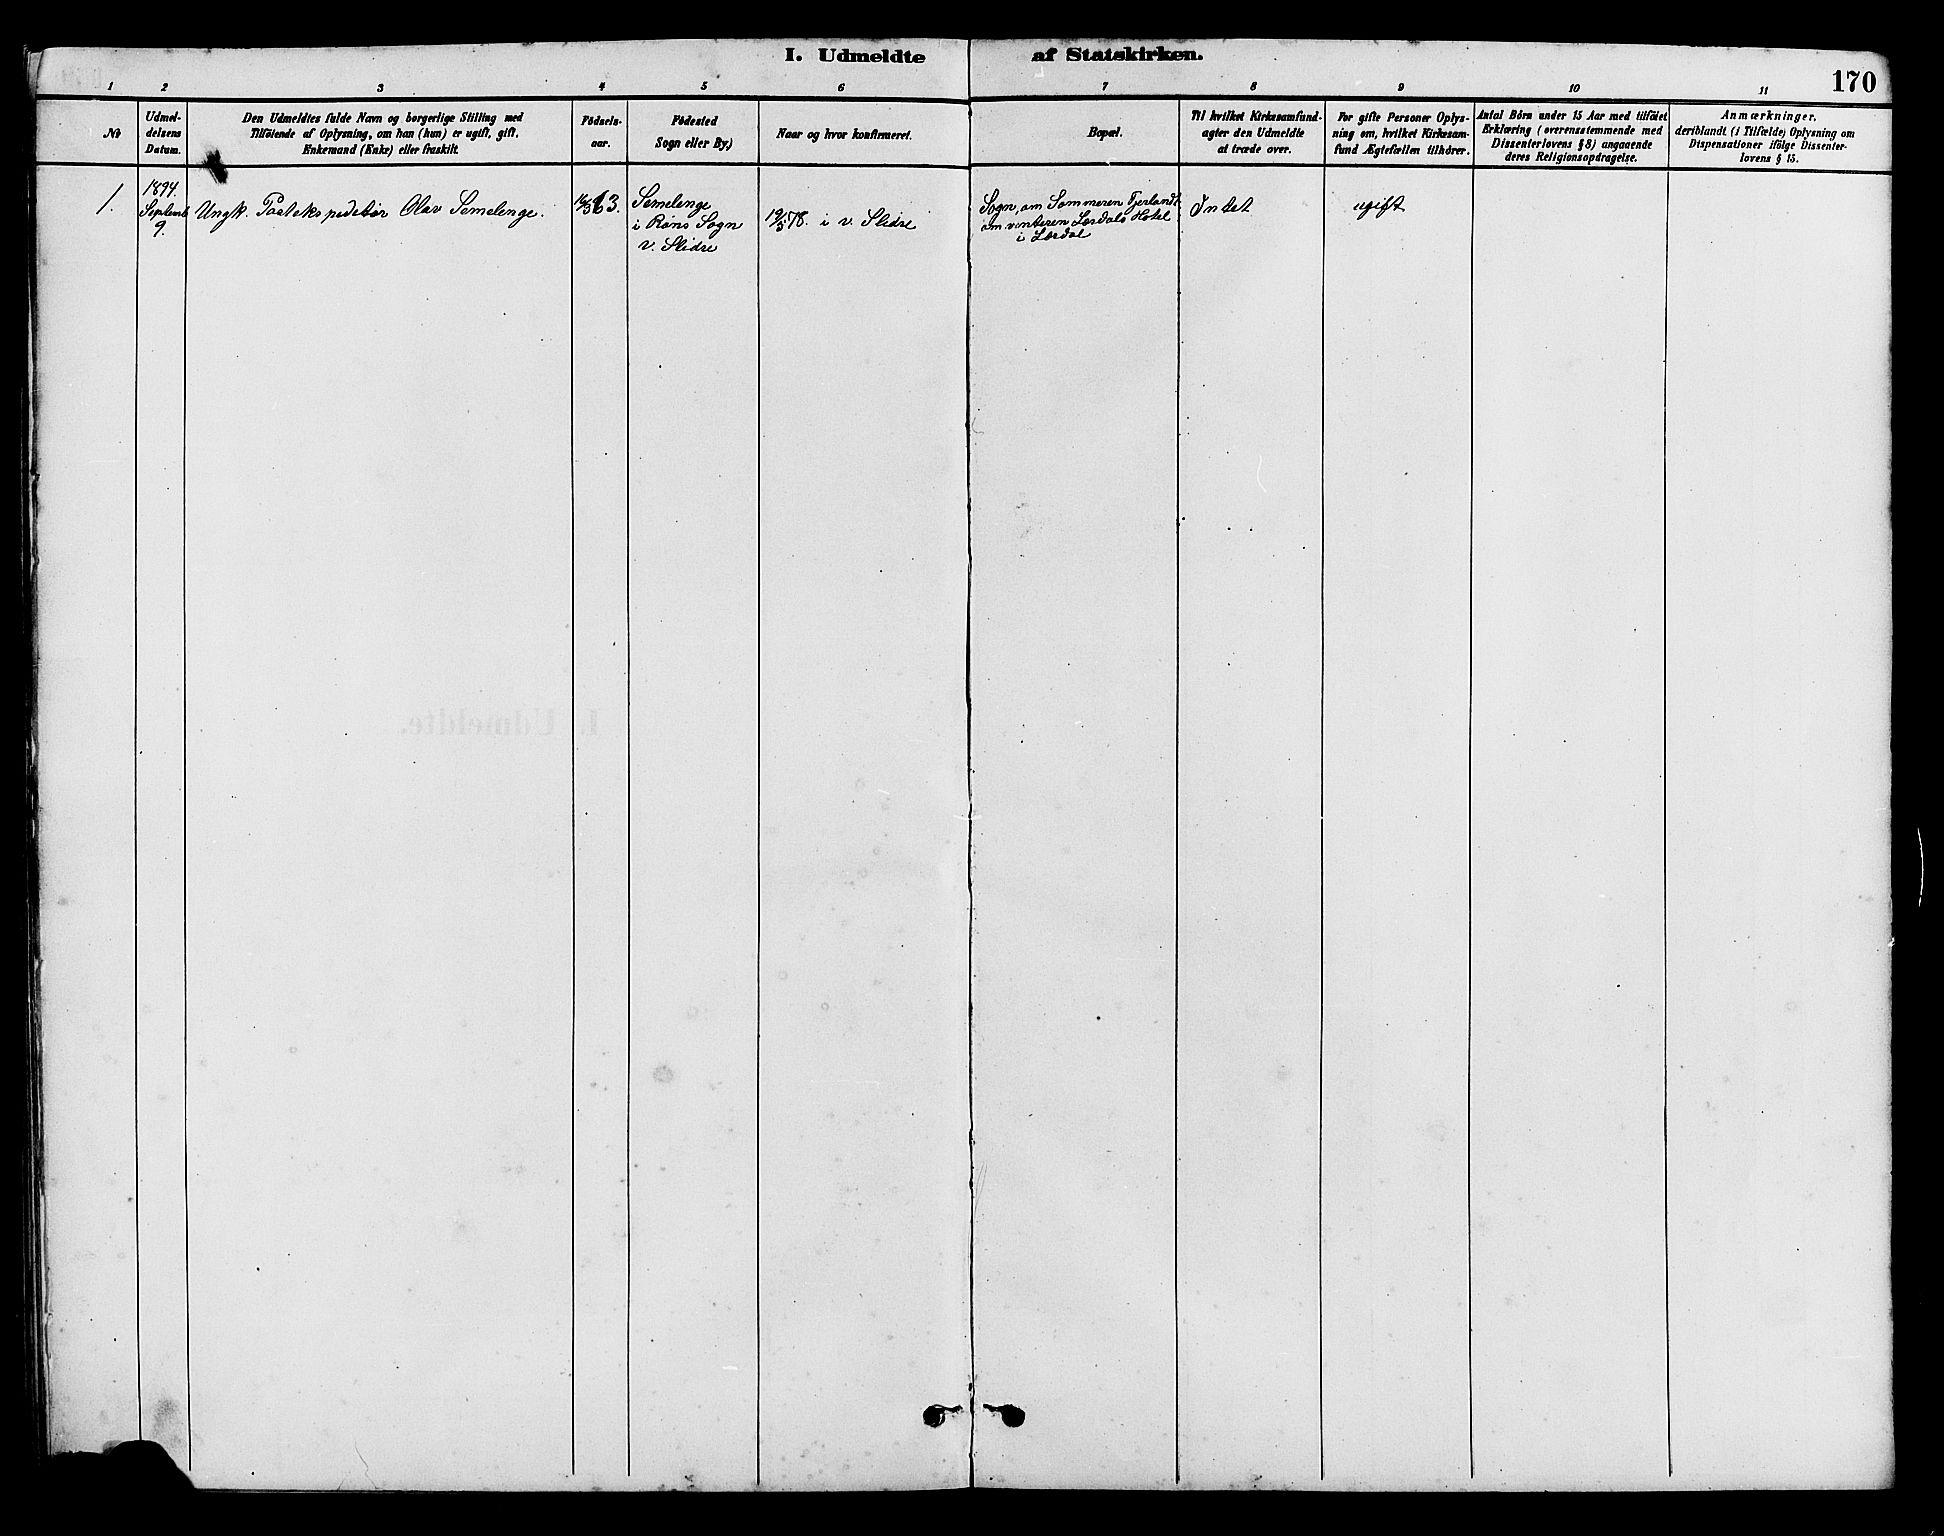 SAH, Vestre Slidre prestekontor, Klokkerbok nr. 5, 1881-1913, s. 170